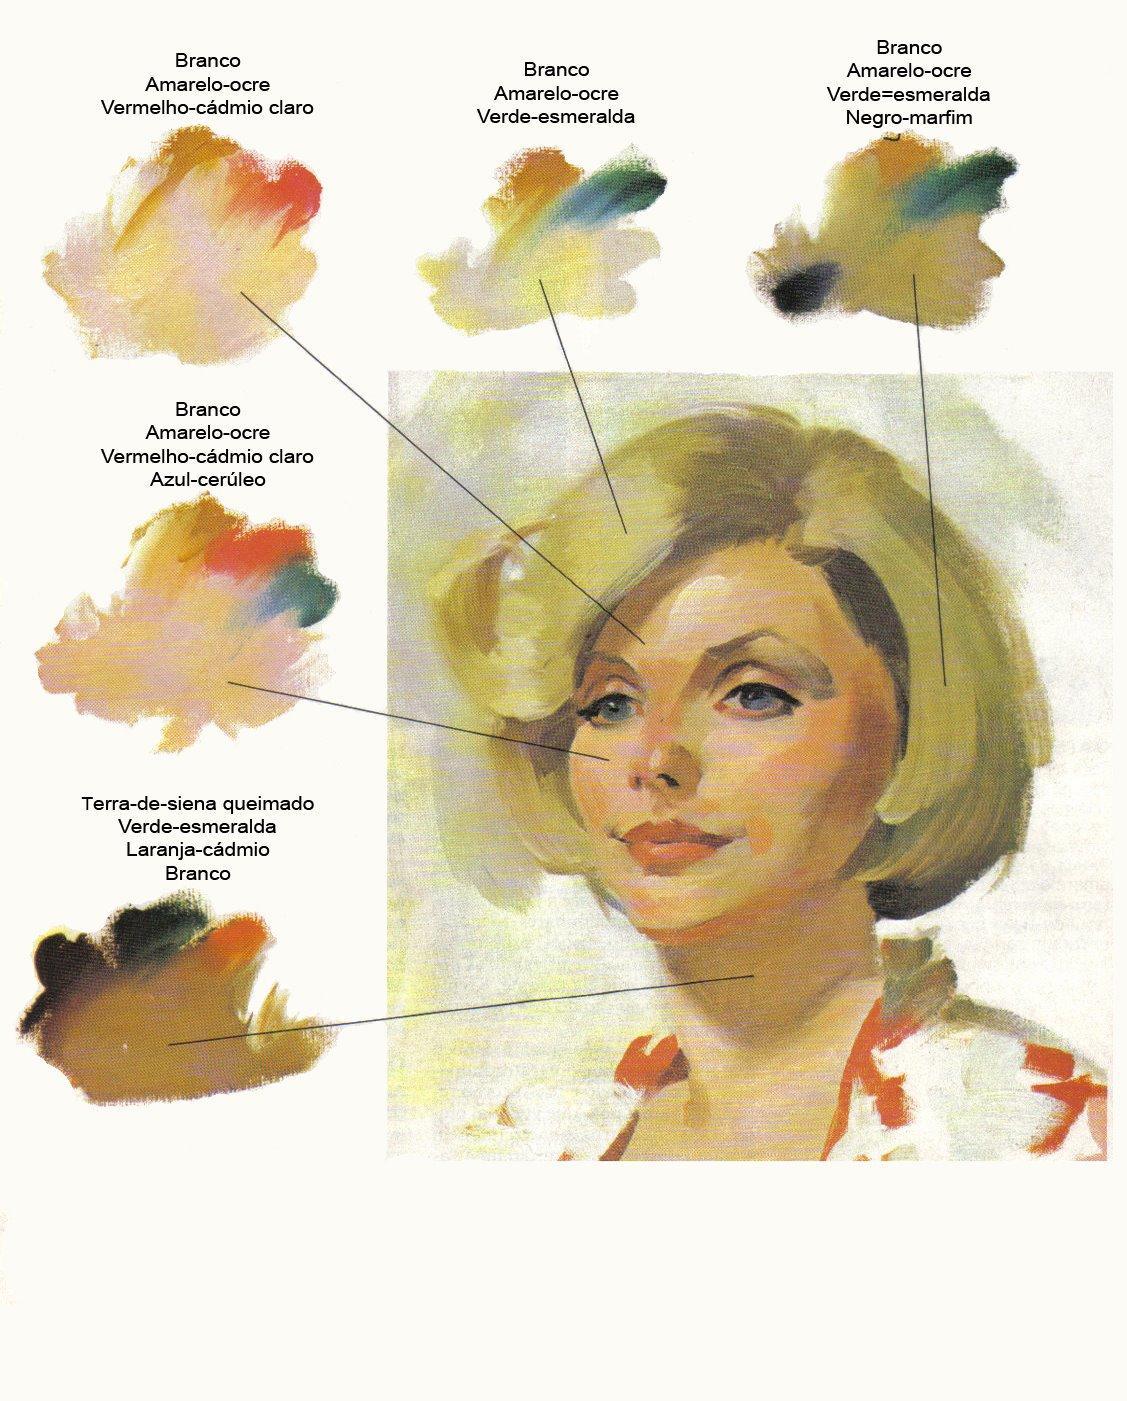 Curso de pintura passo a passo: Segredos do retrato a óleo #173392 on  #4E6C61 1127x1401